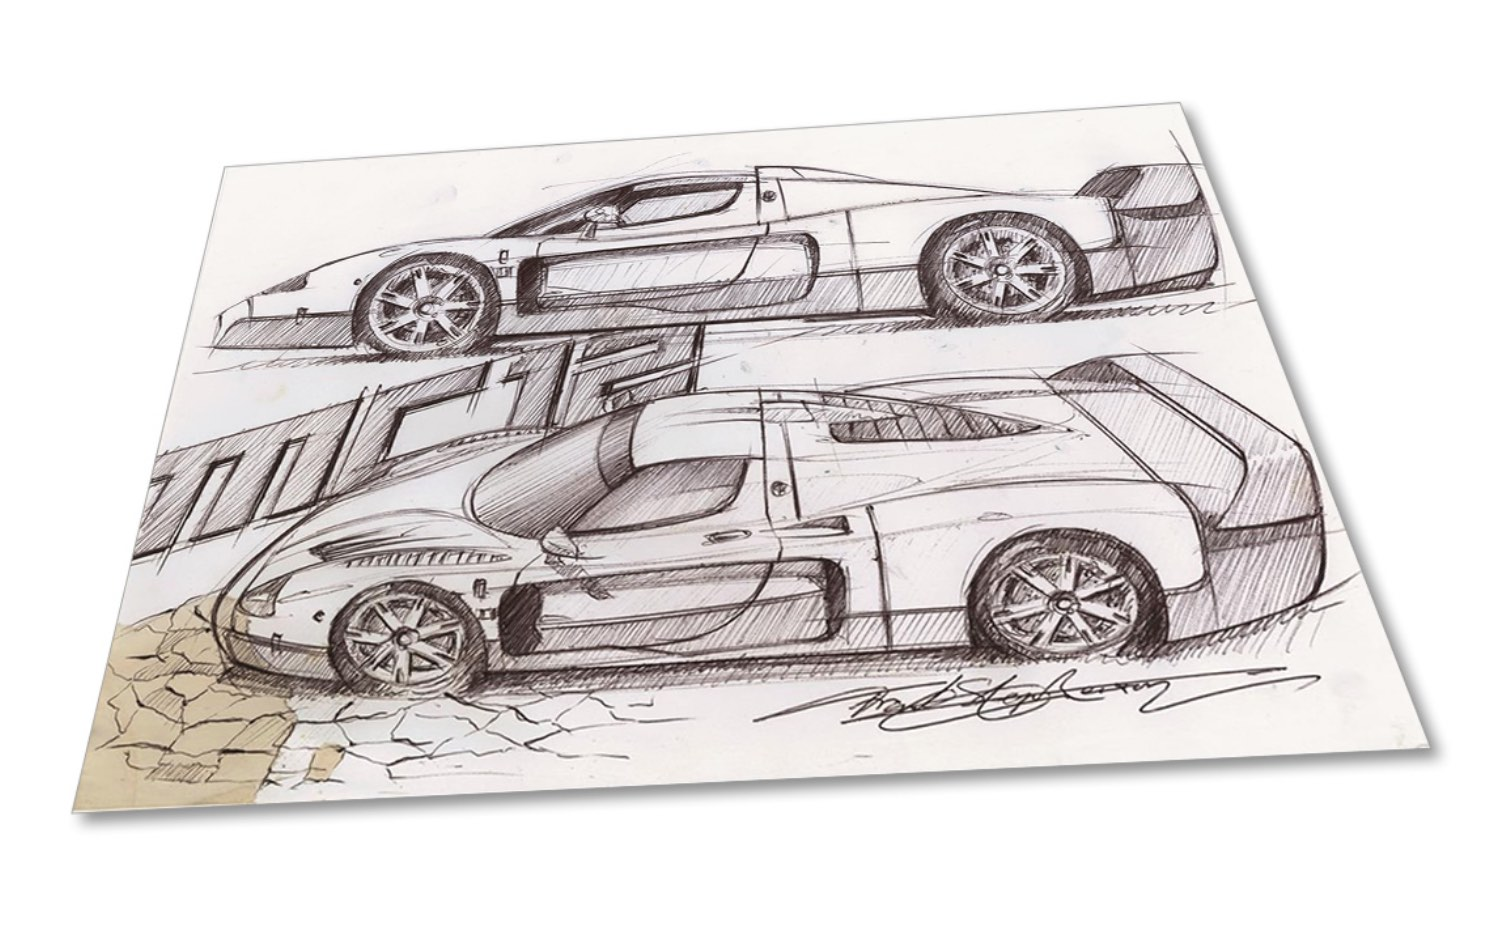 Frank Stephenson Design offers limited edition prints